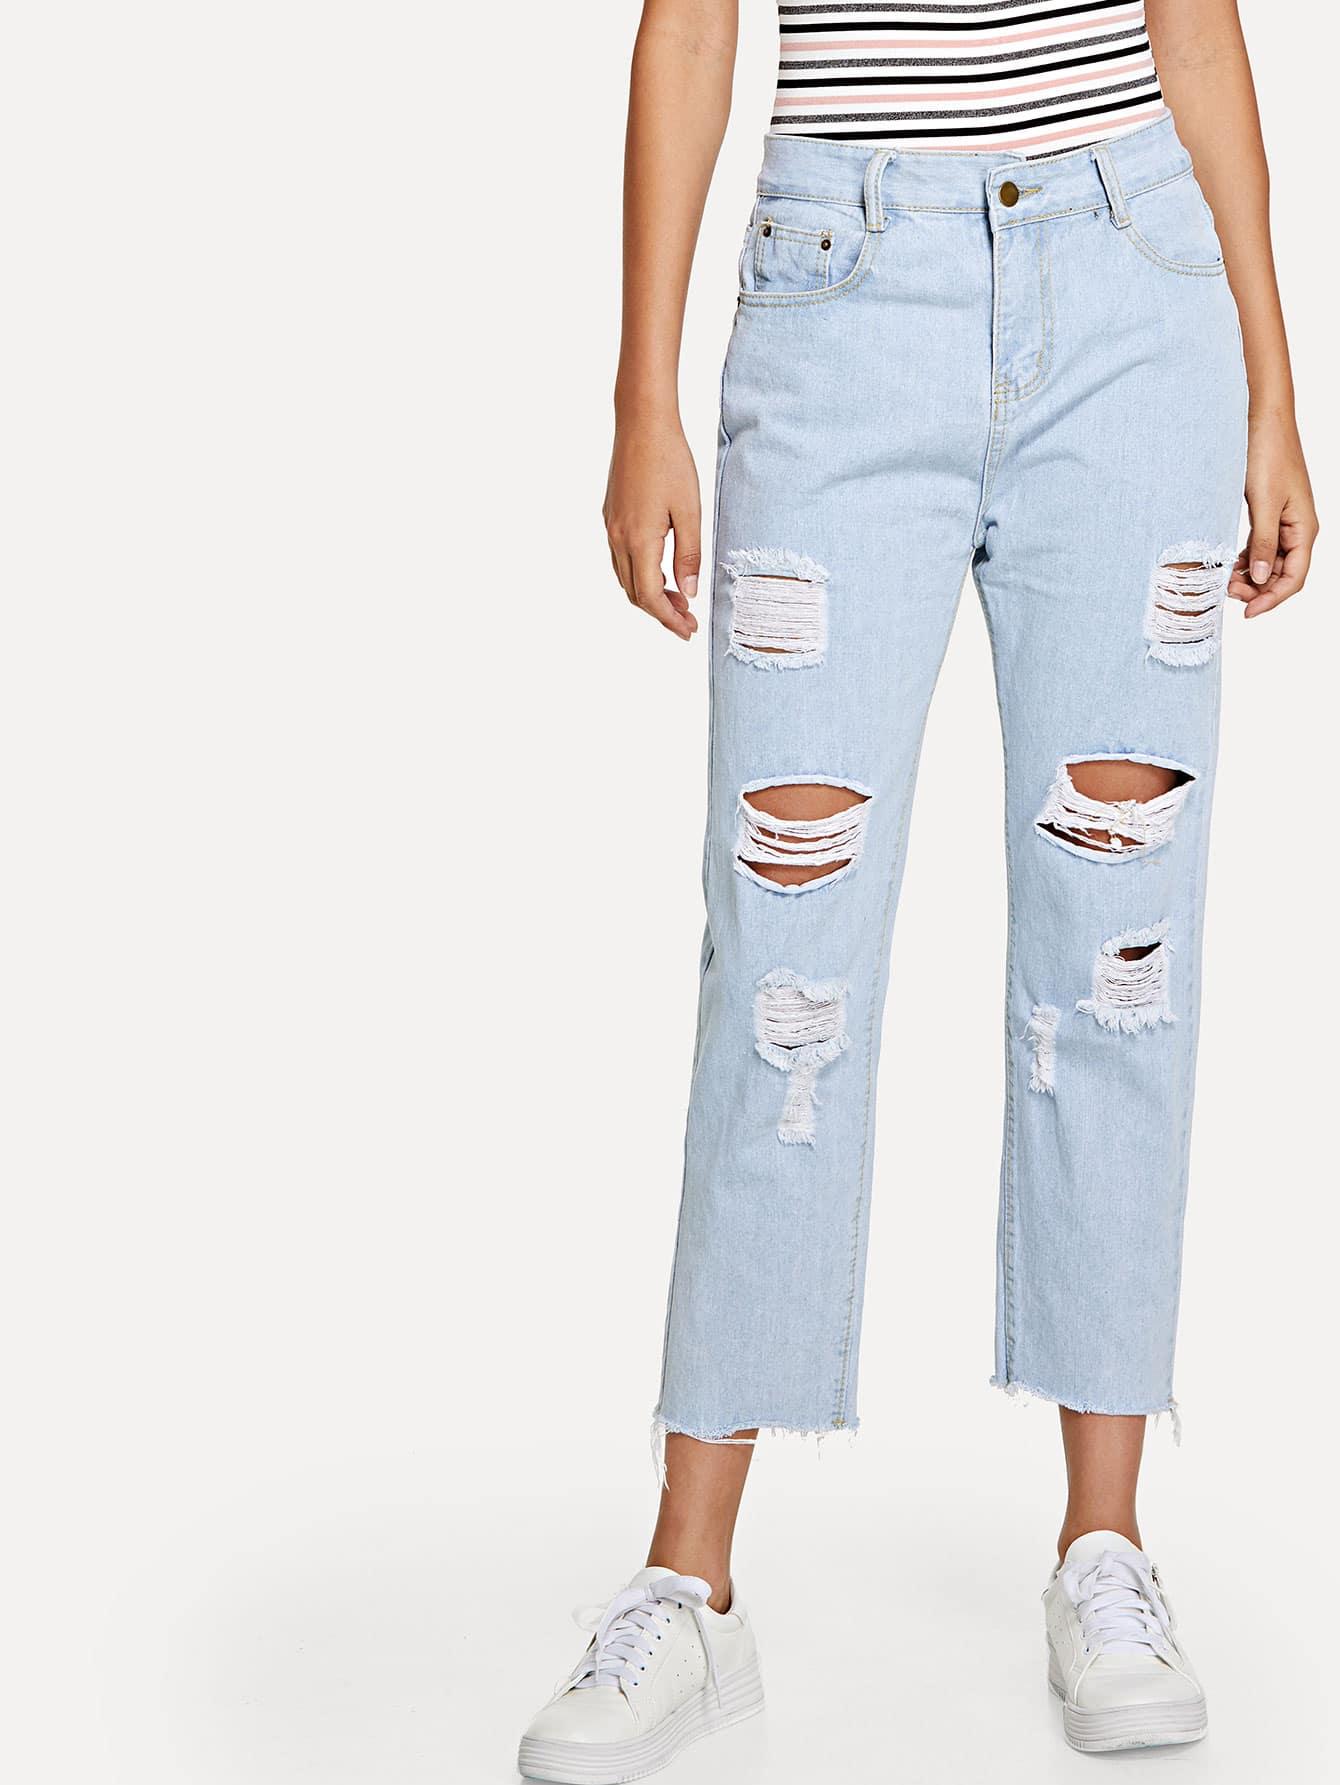 Raw Hem Ripped Wide Leg Jeans wide striped ripped dress